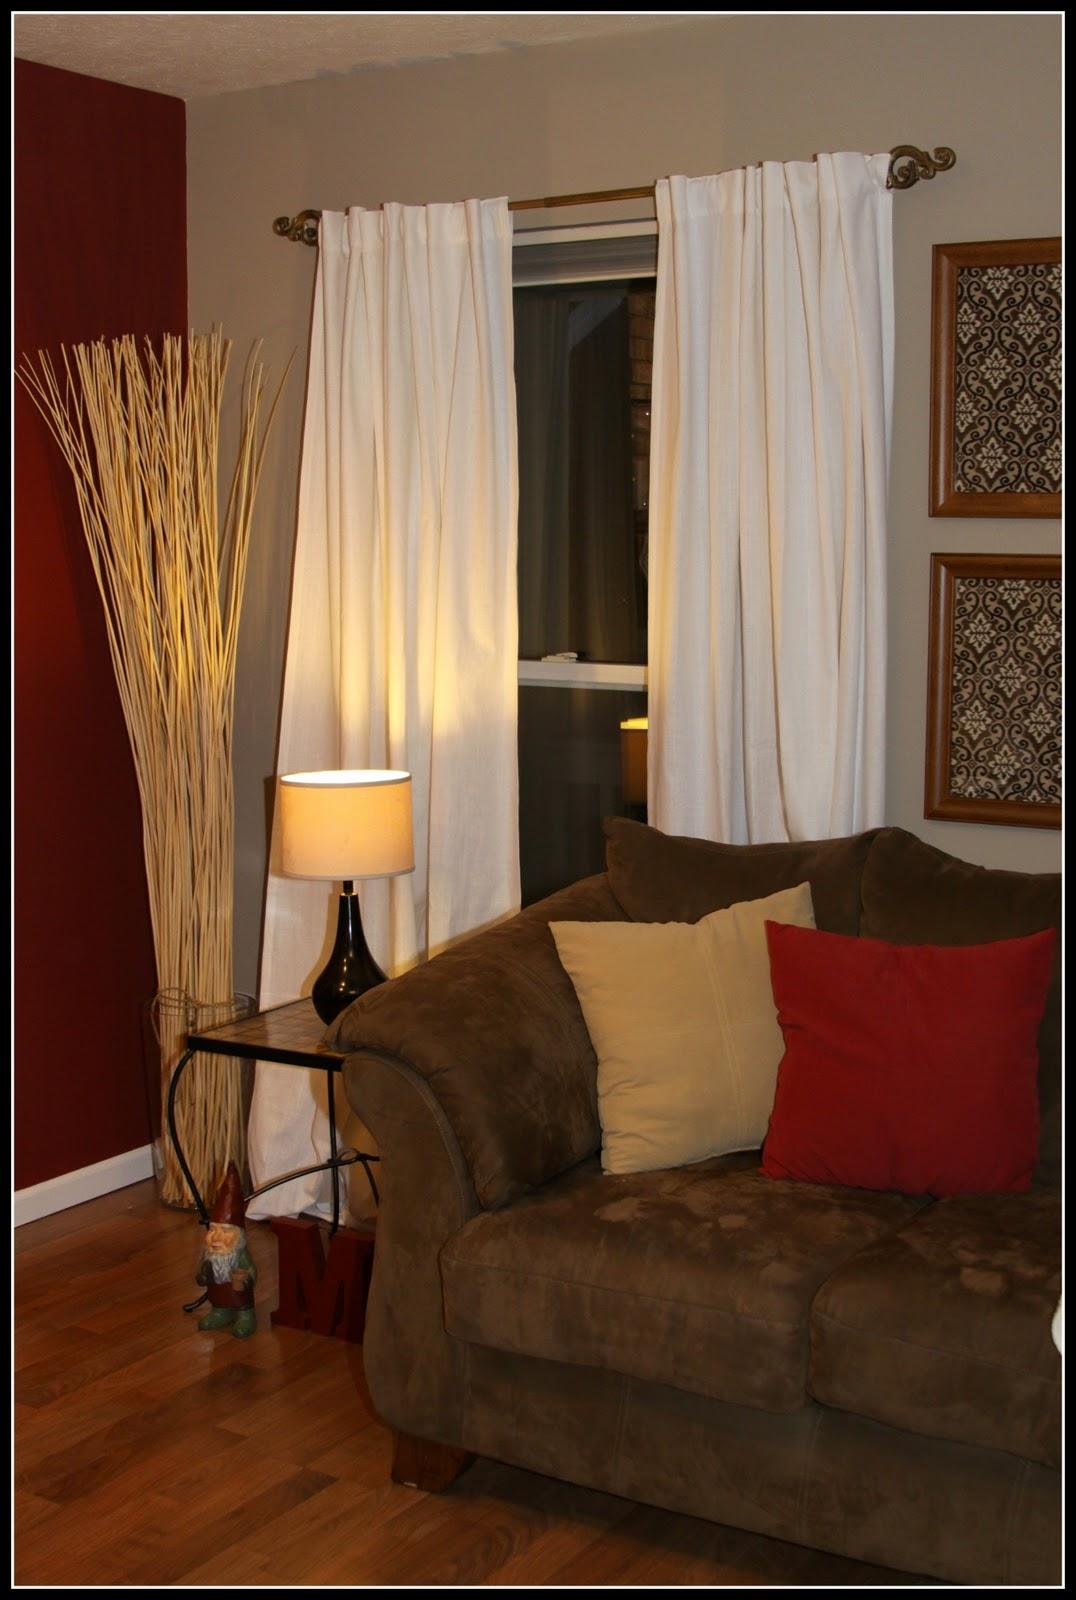 Ikea Kids Curtains The plain white ikea curtains